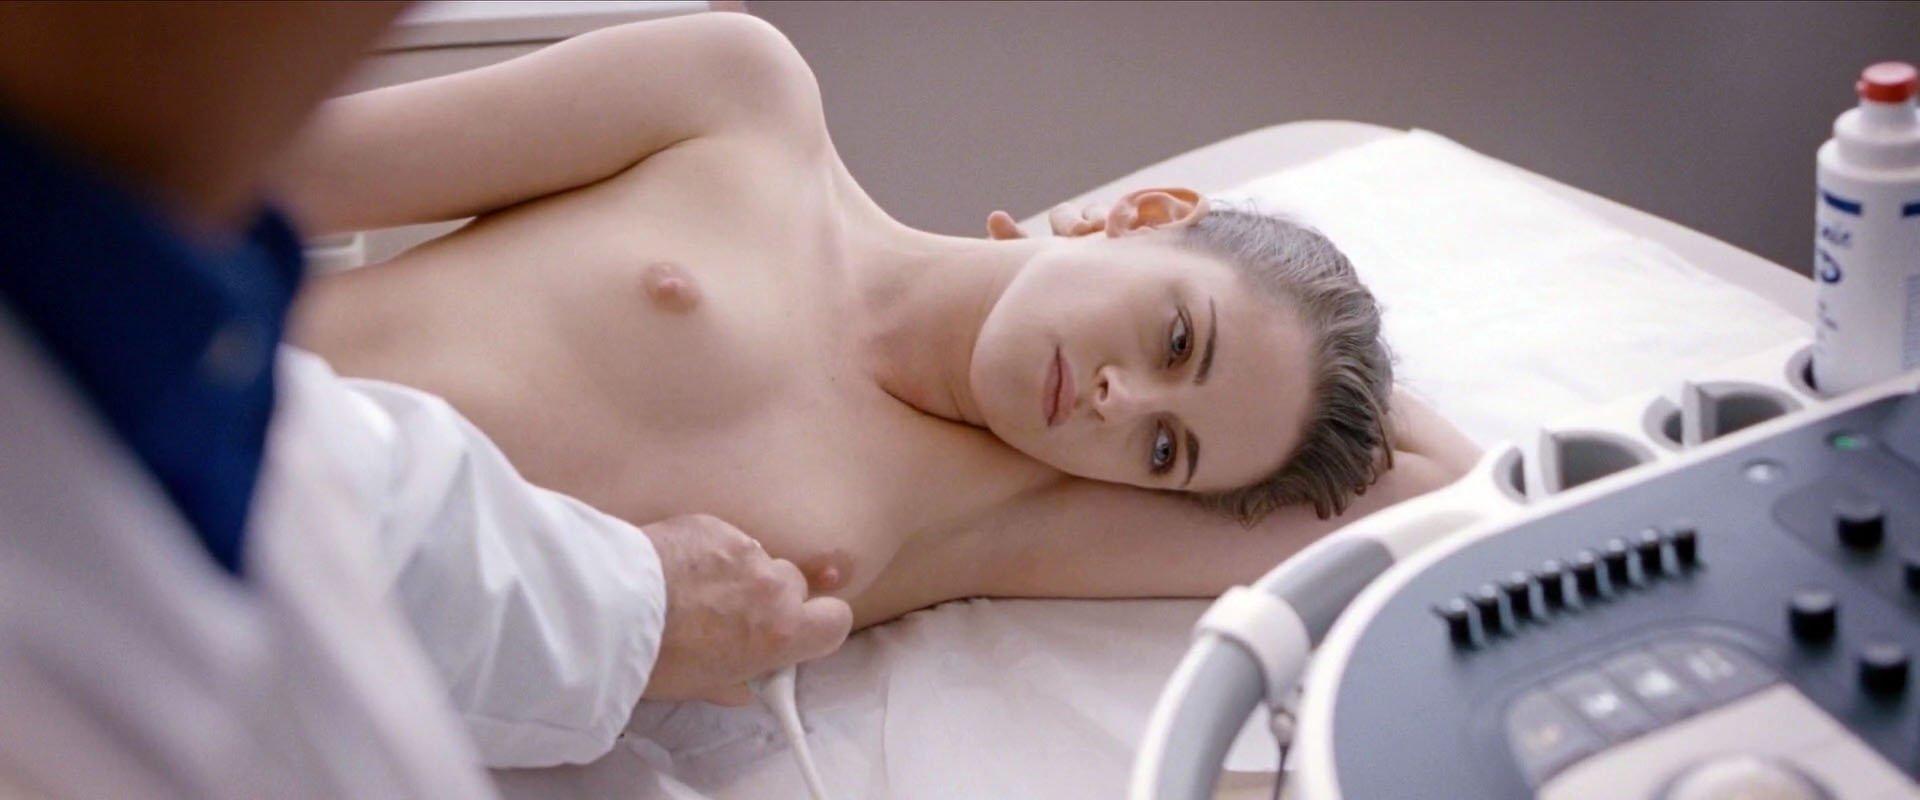 Laura dern nude fakes